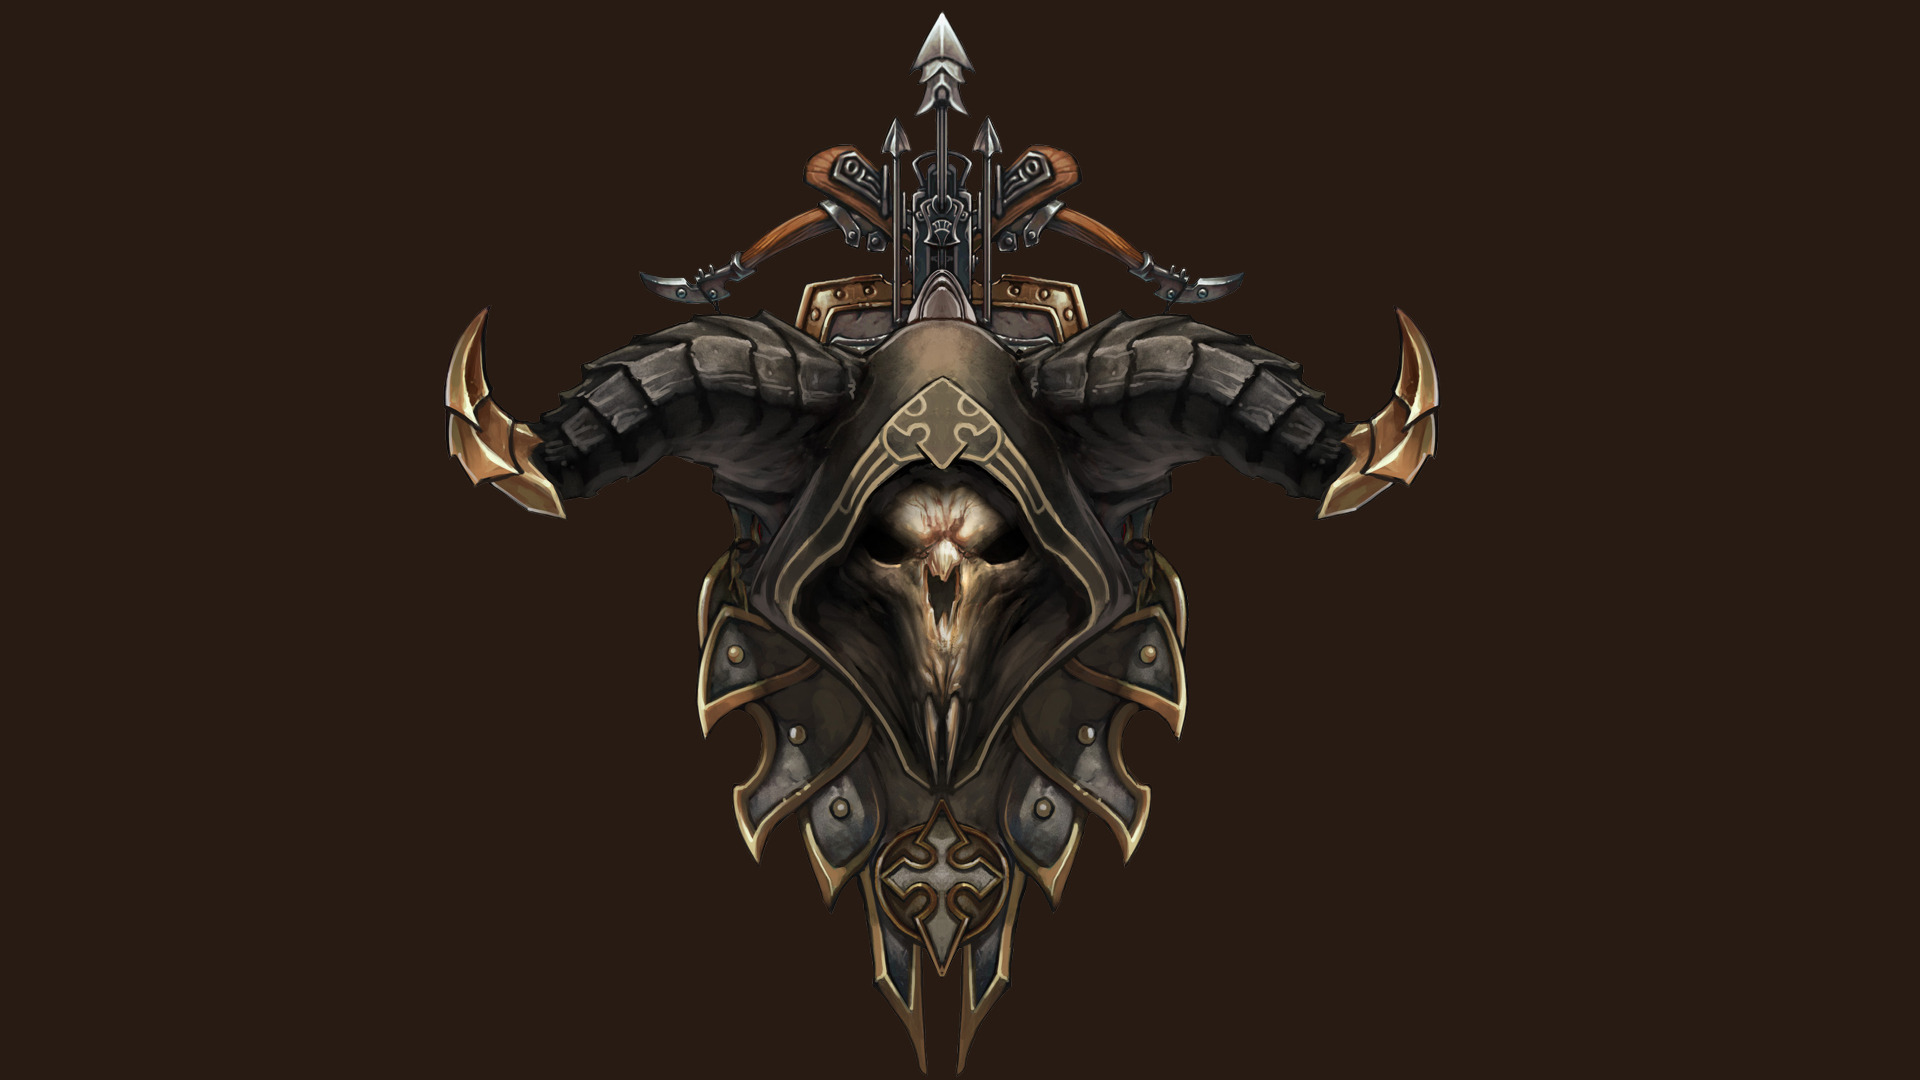 48 Diablo 3 Demon Hunter Wallpaper On Wallpapersafari